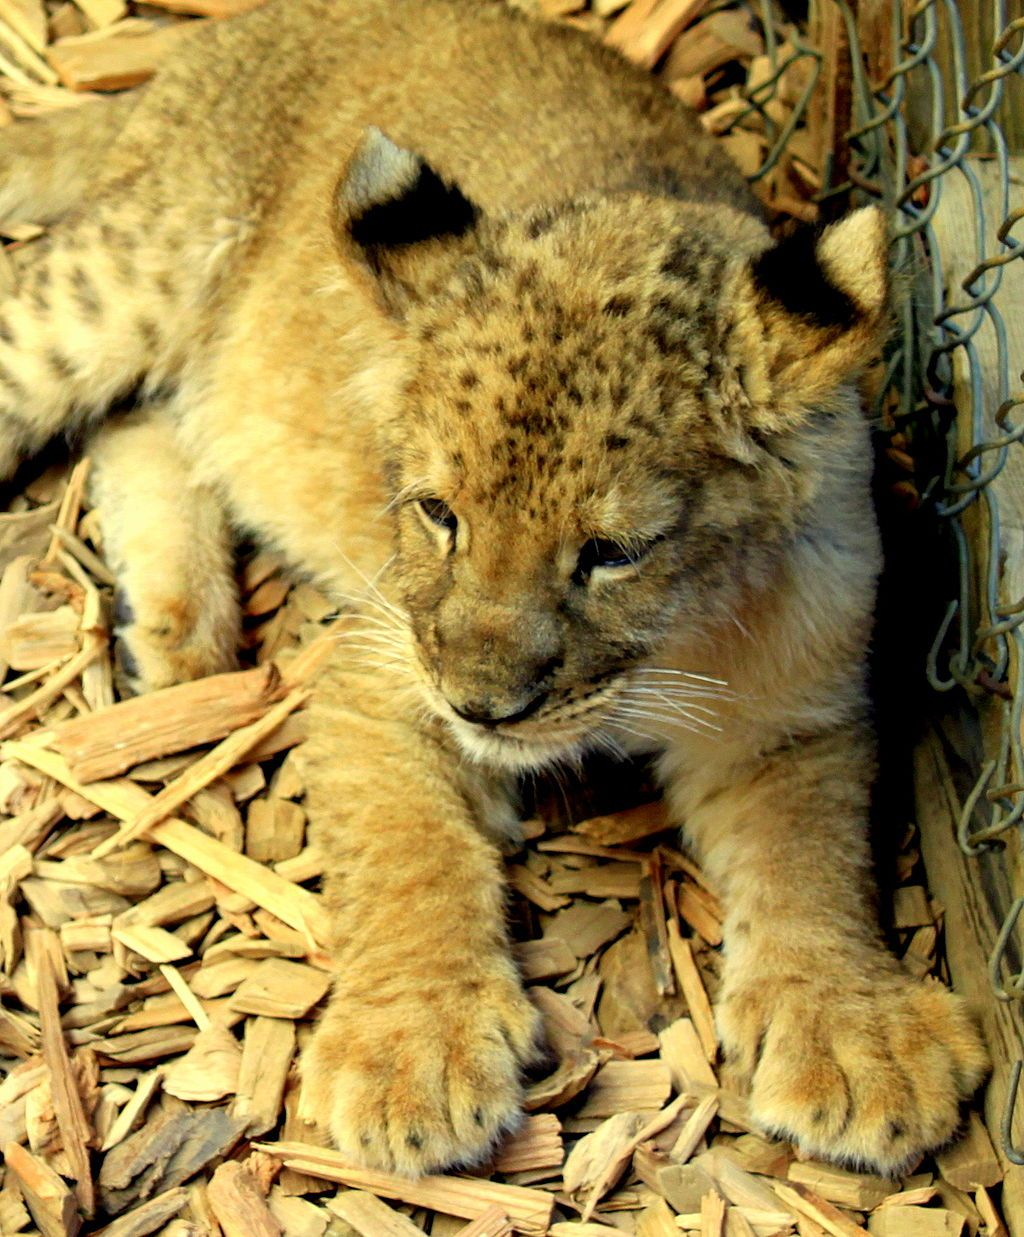 A Lion in West Coast Game Park Safari